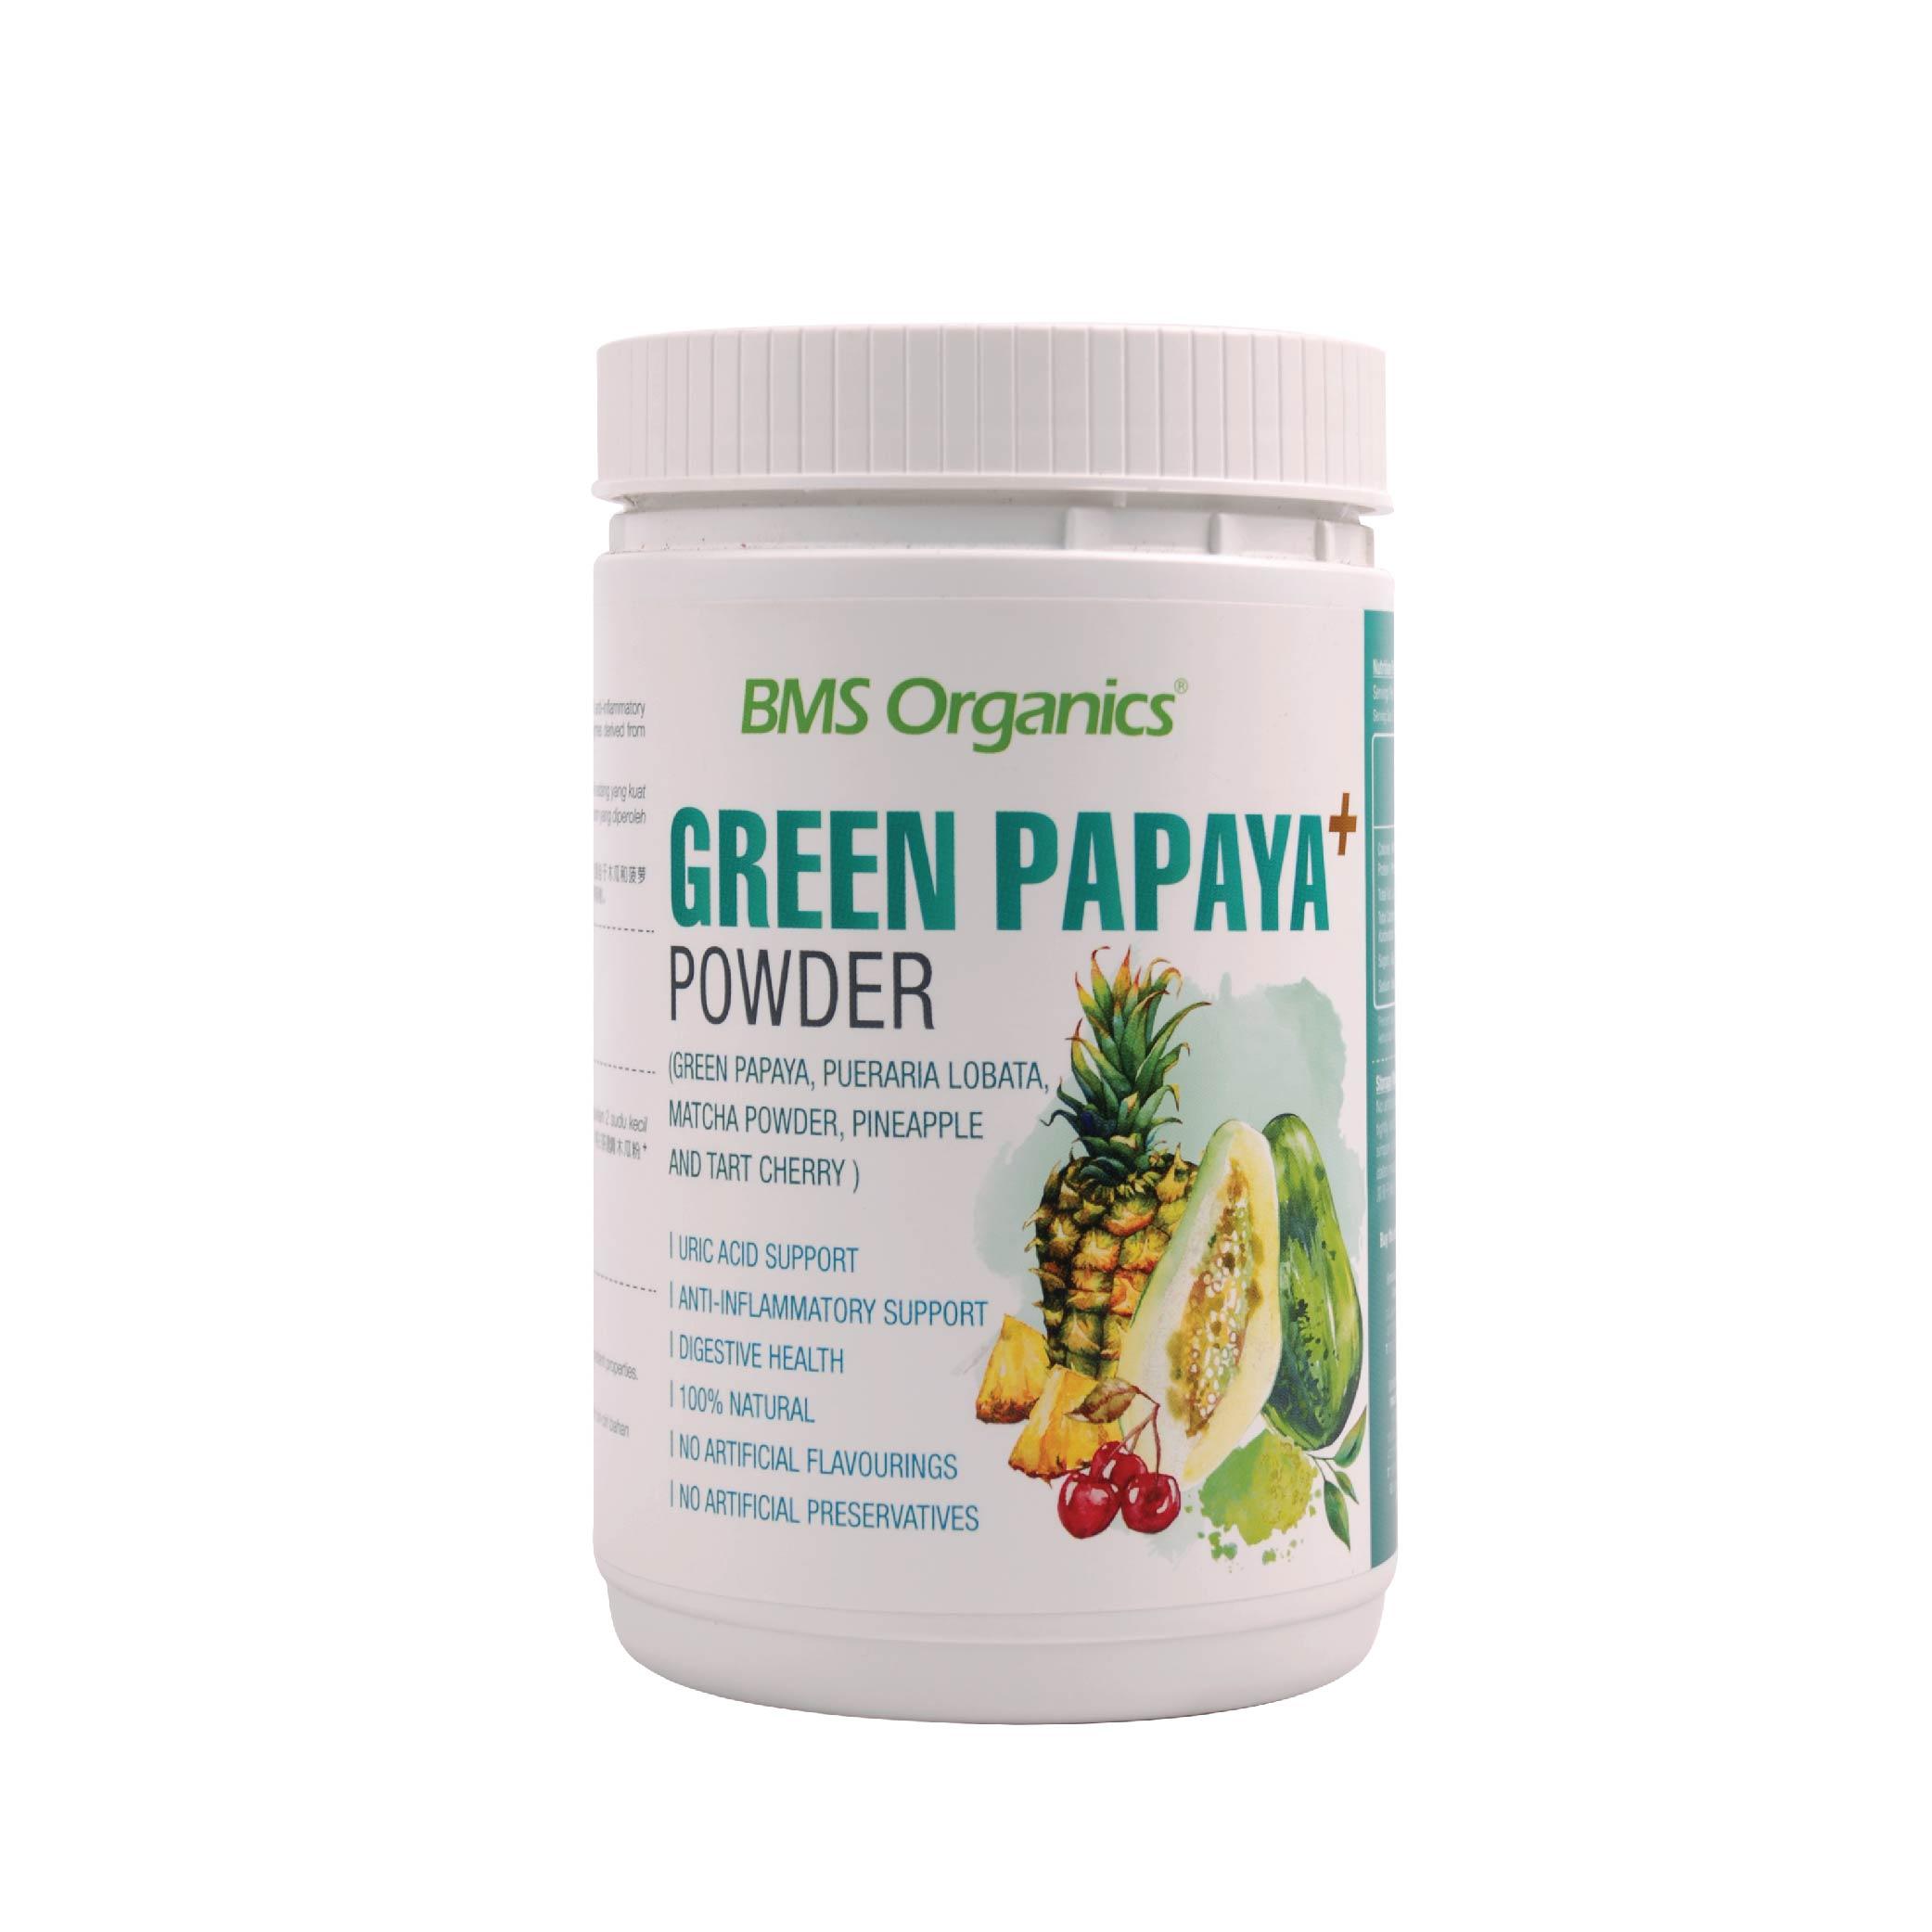 BMS Organics-Green Papaya+ Powder (150g)